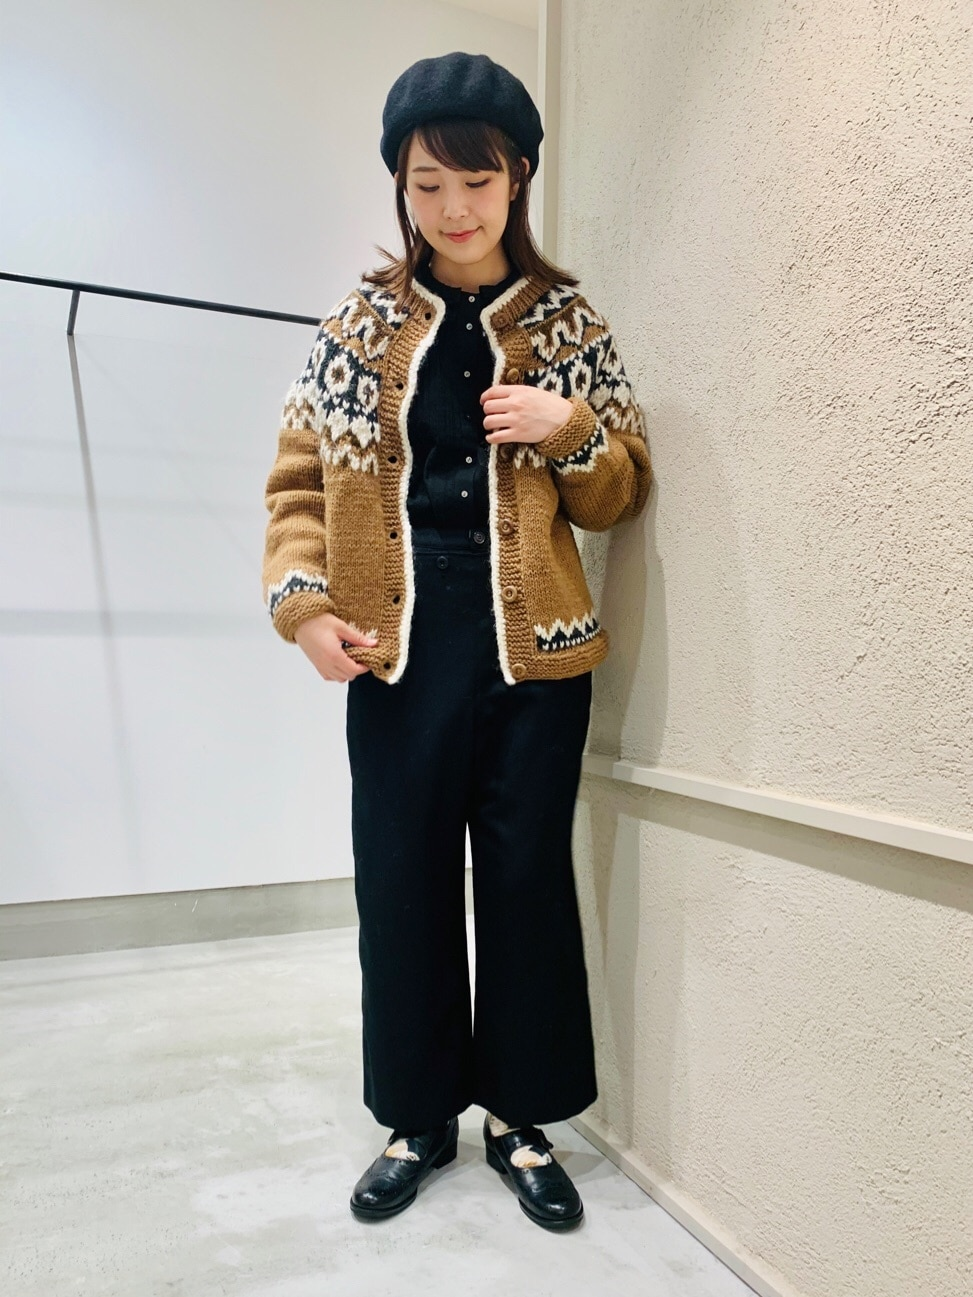 chambre de charme 横浜ジョイナス 身長:162cm 2020.11.16